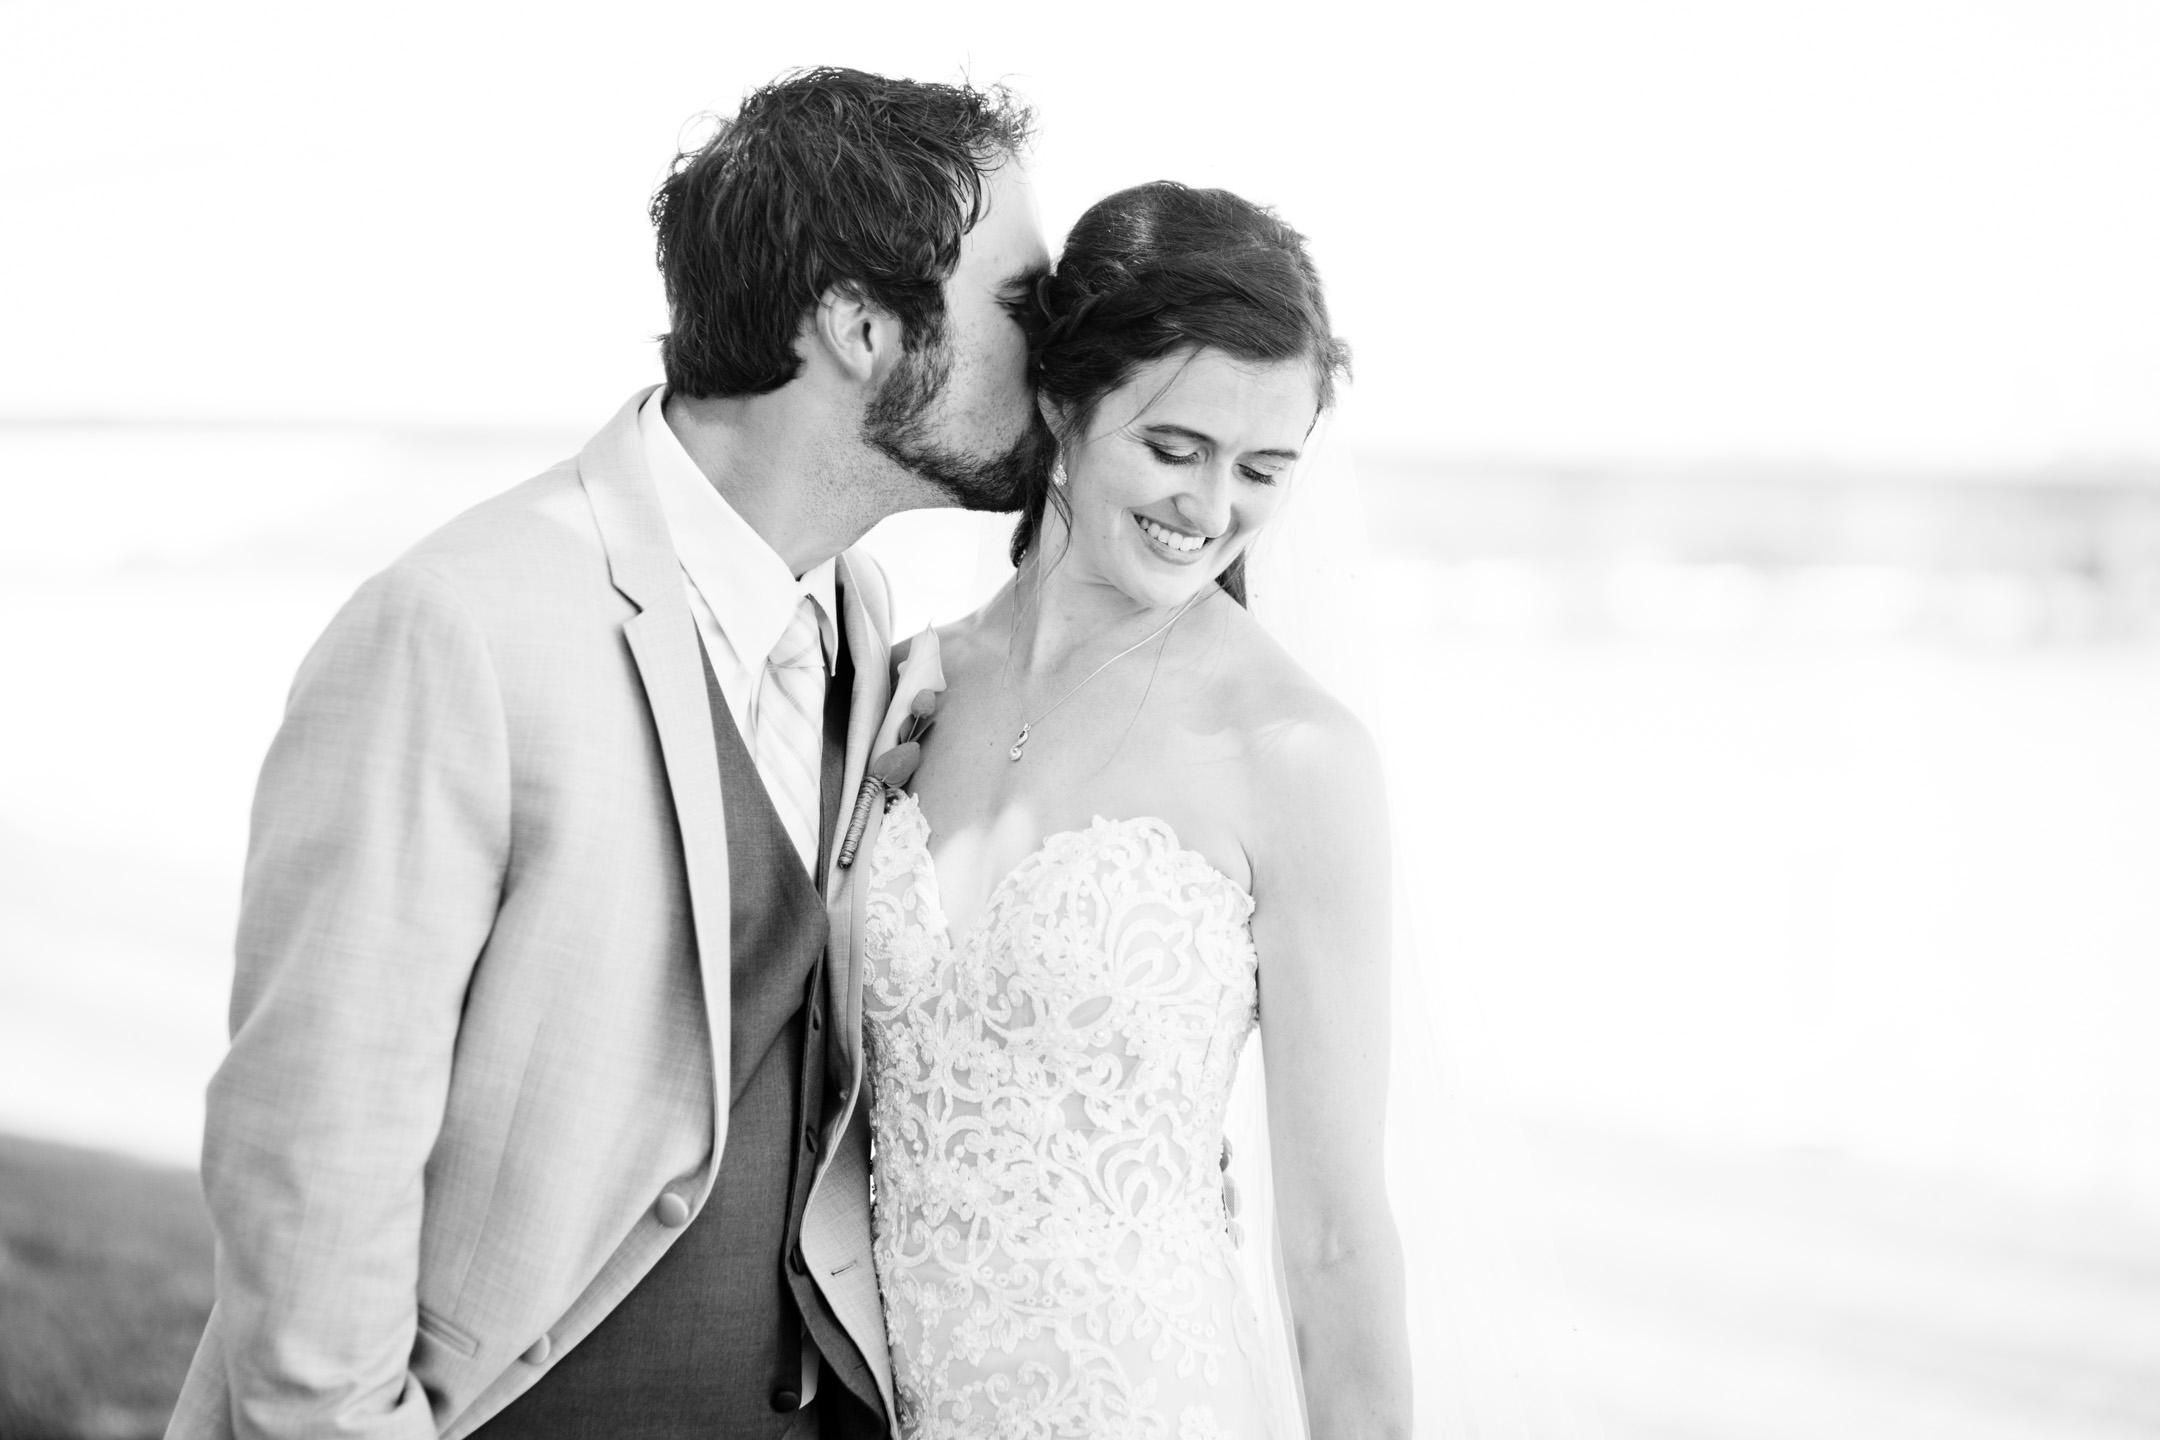 wedding day portraits amelia renee photography Iowa